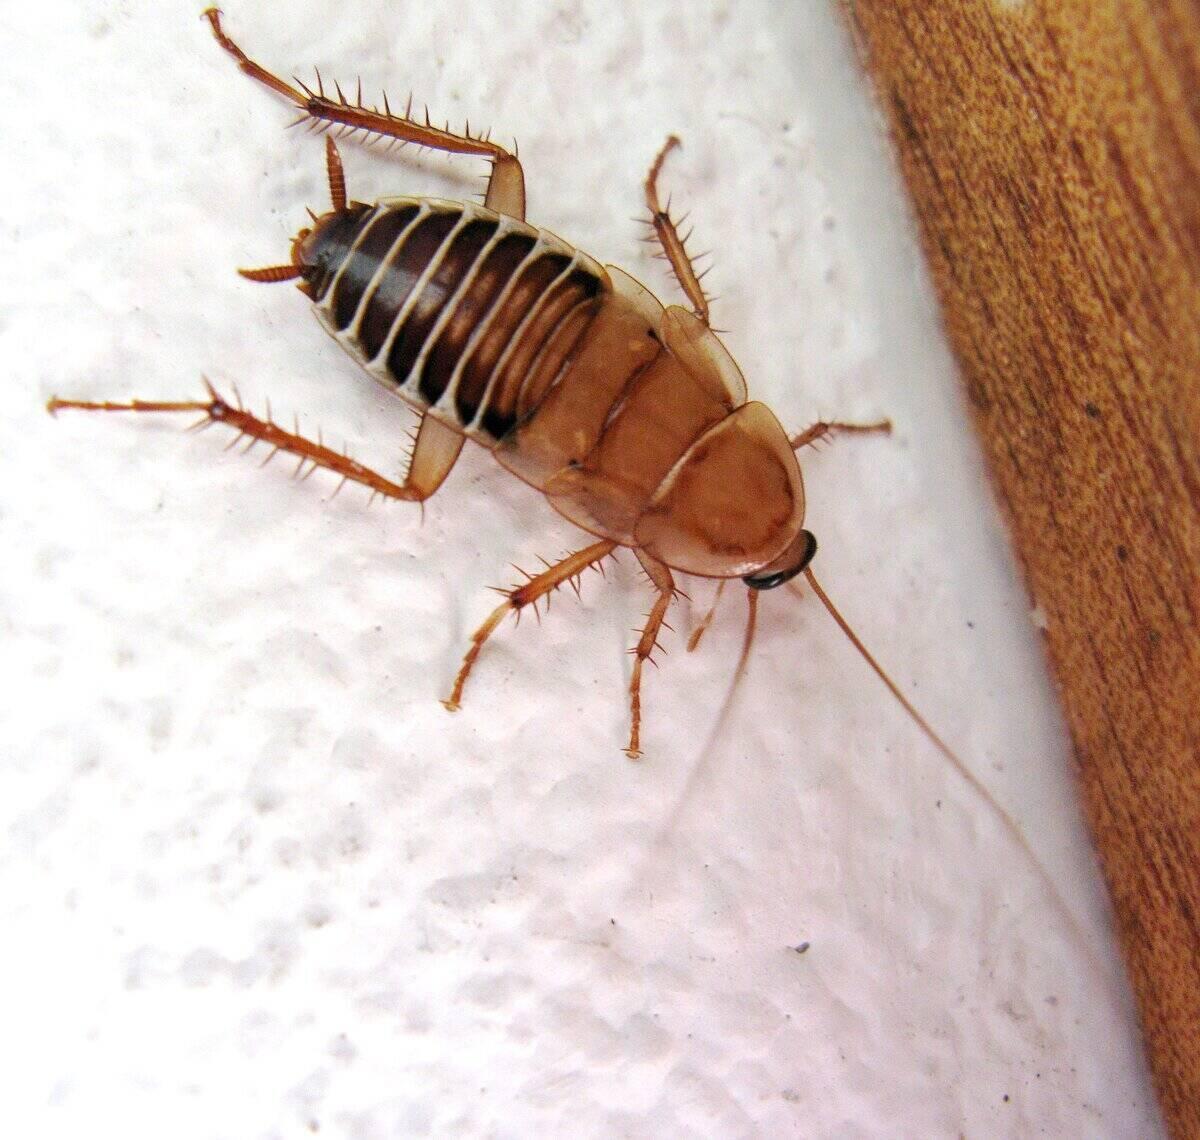 Close-up of a single cockroach